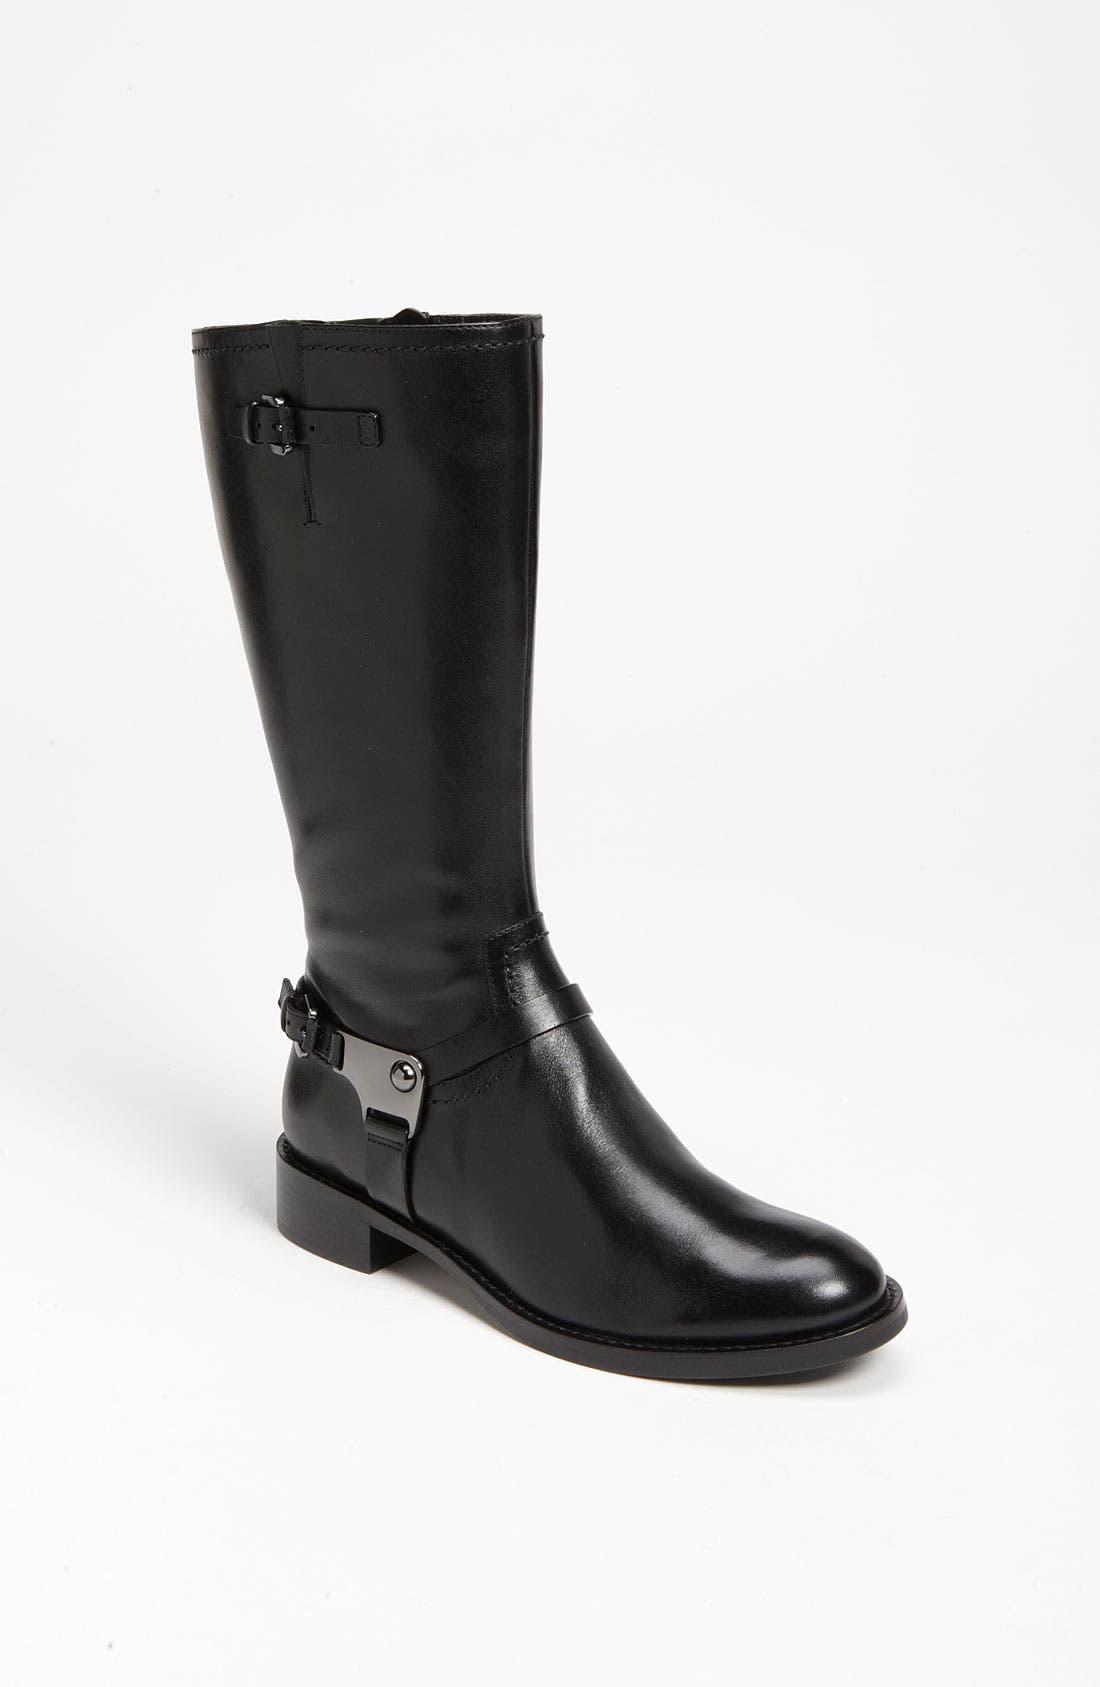 Alternate Image 1 Selected - ECCO 'Hobart' Harness Boot